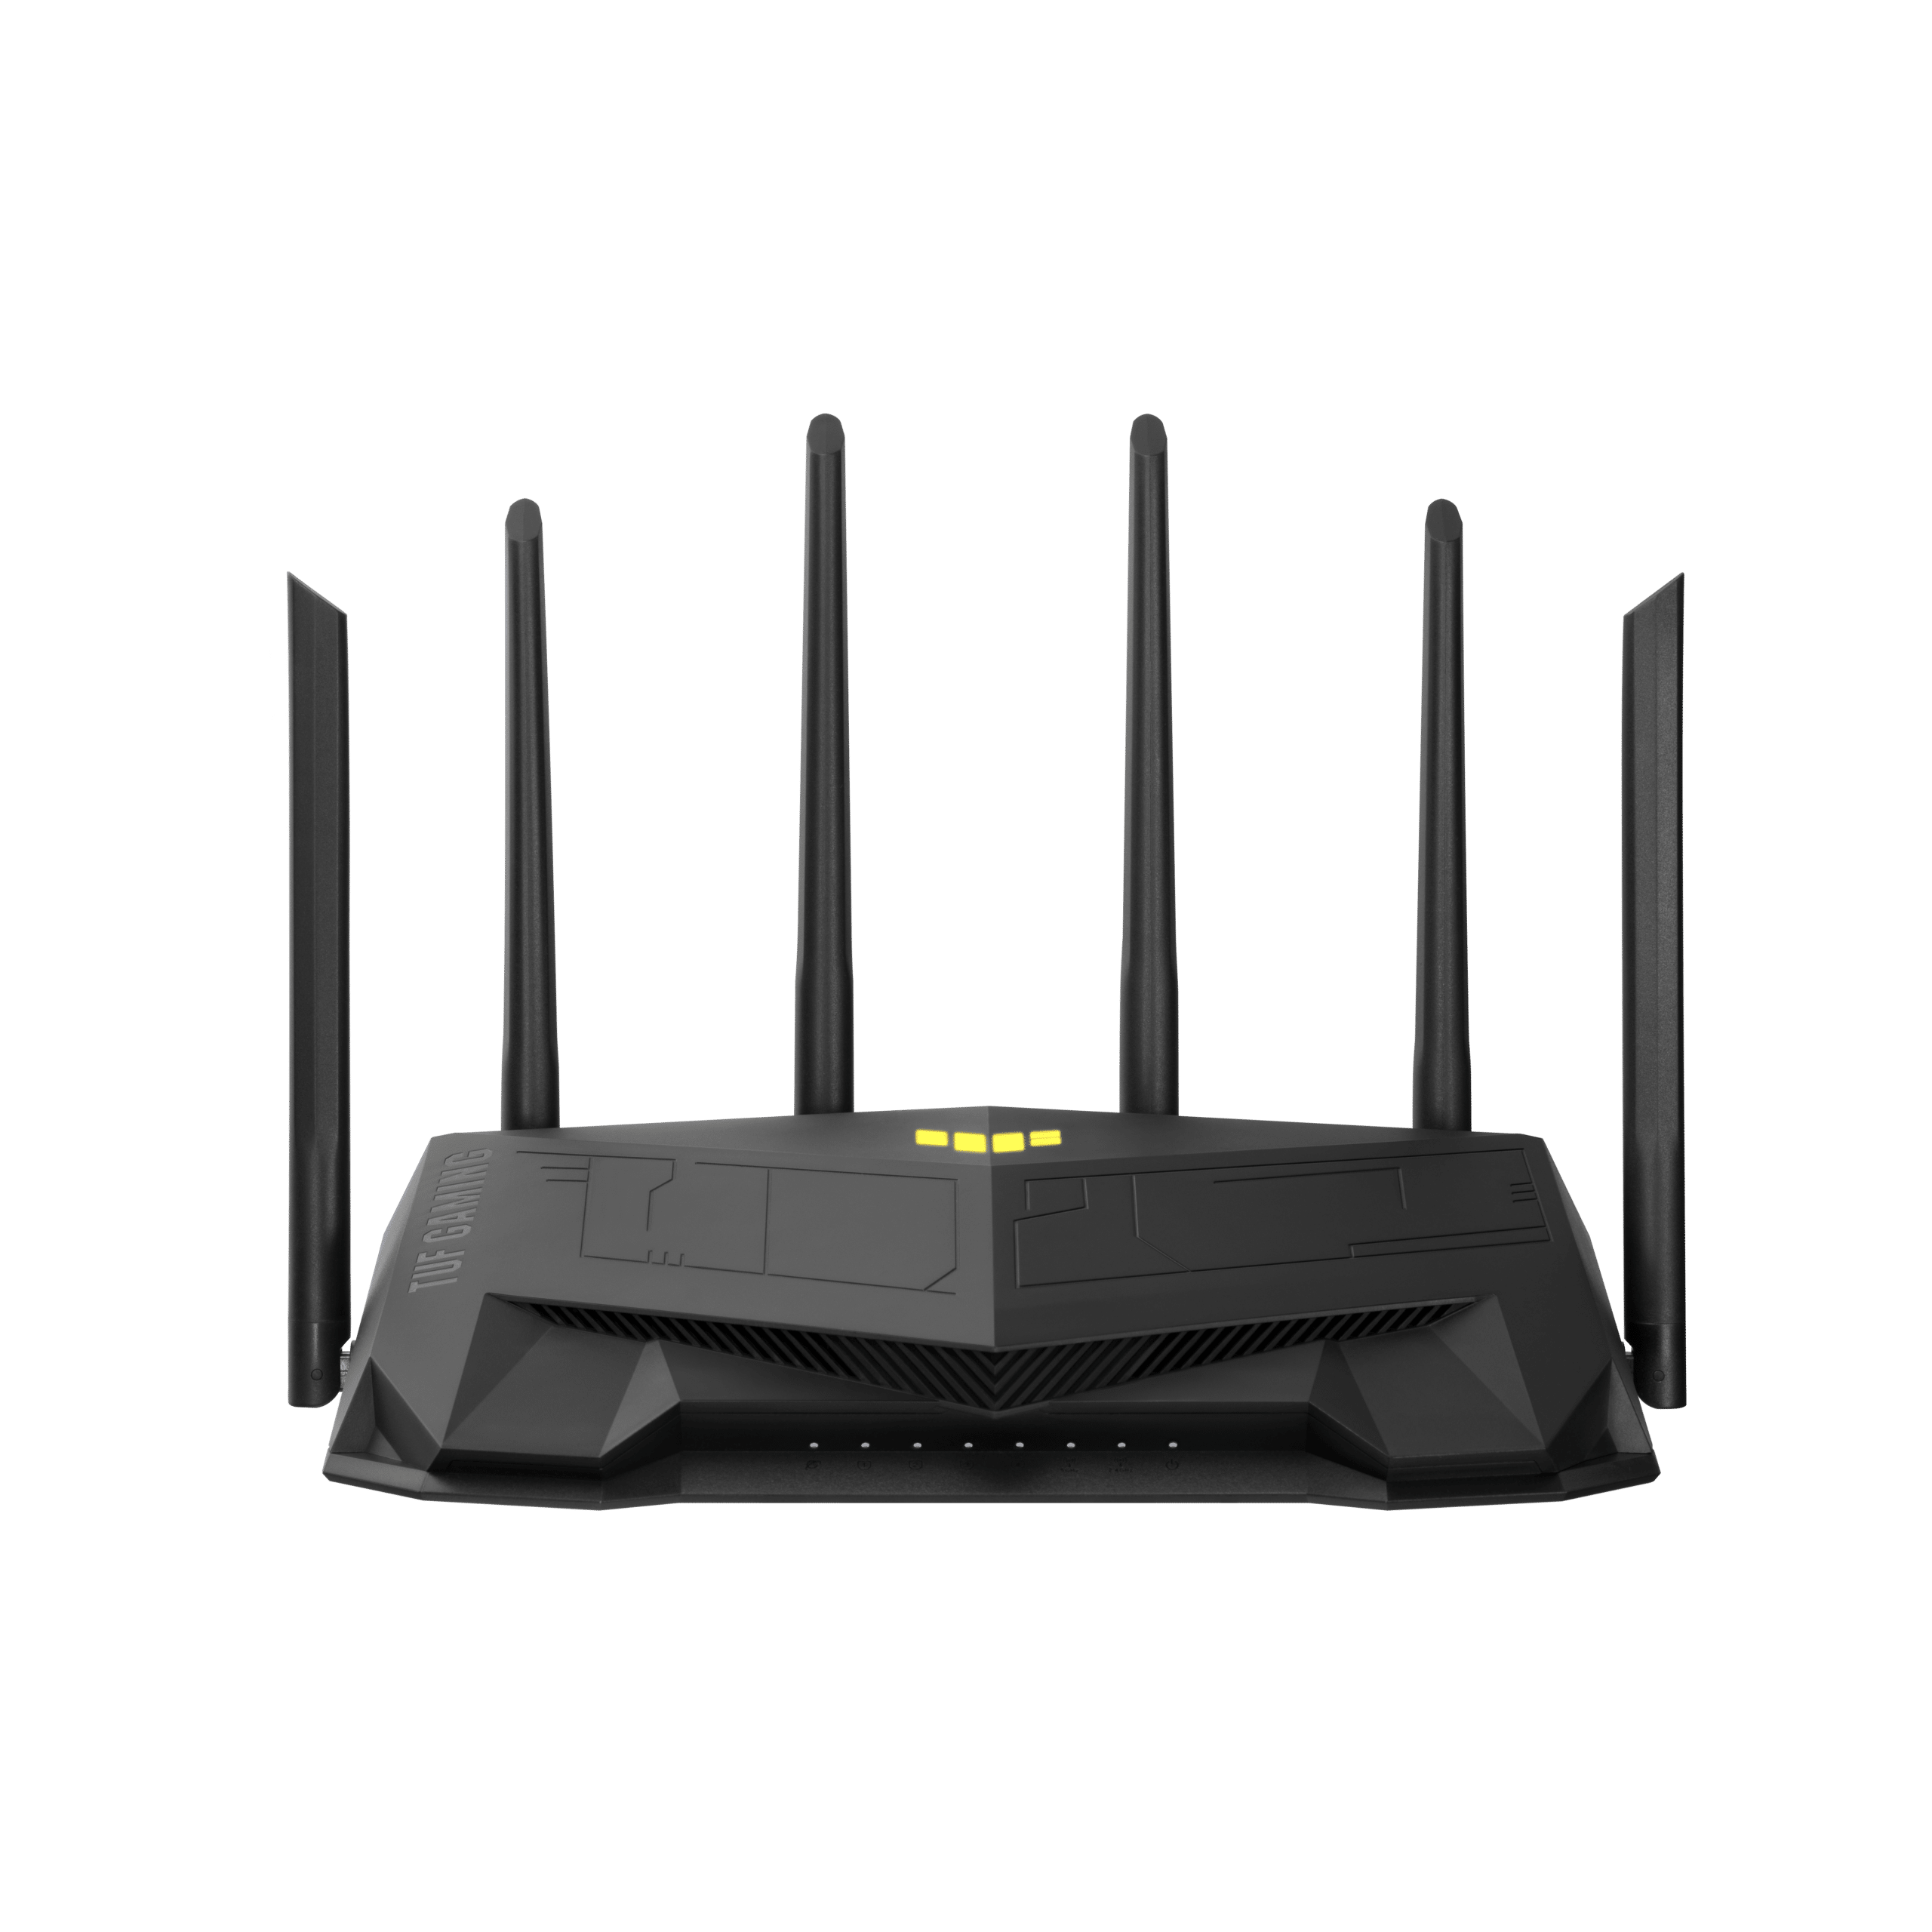 ASUS presenta i router ROG Strix GS-AX5400, GS-AX3000 e TUF Gaming AX5400 thumbnail